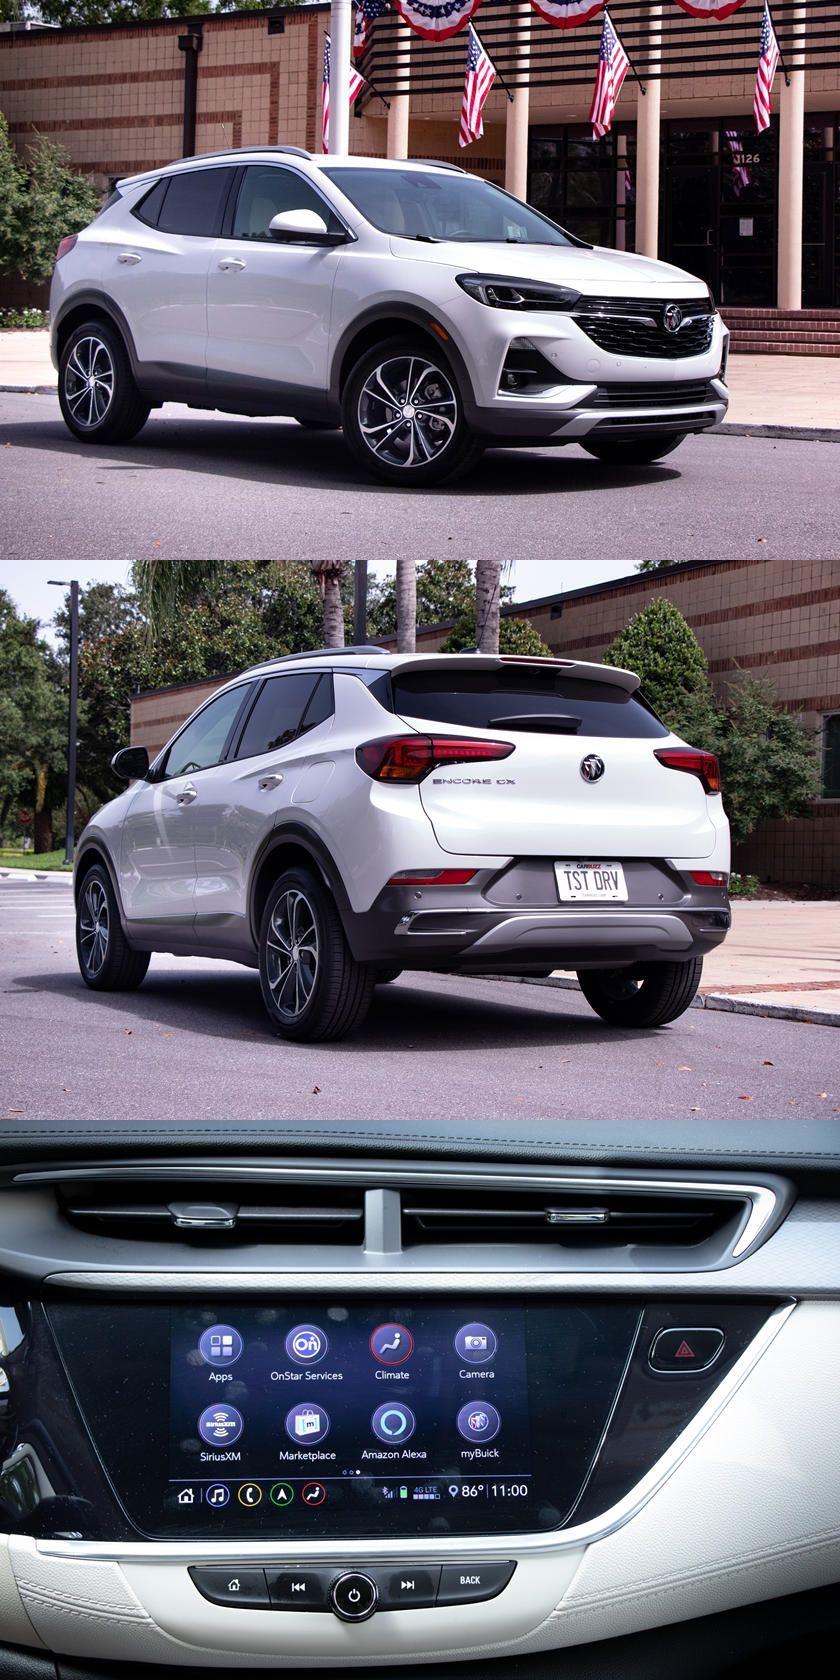 2020 Suv Luxury Buick Buick Encore Gx Interior